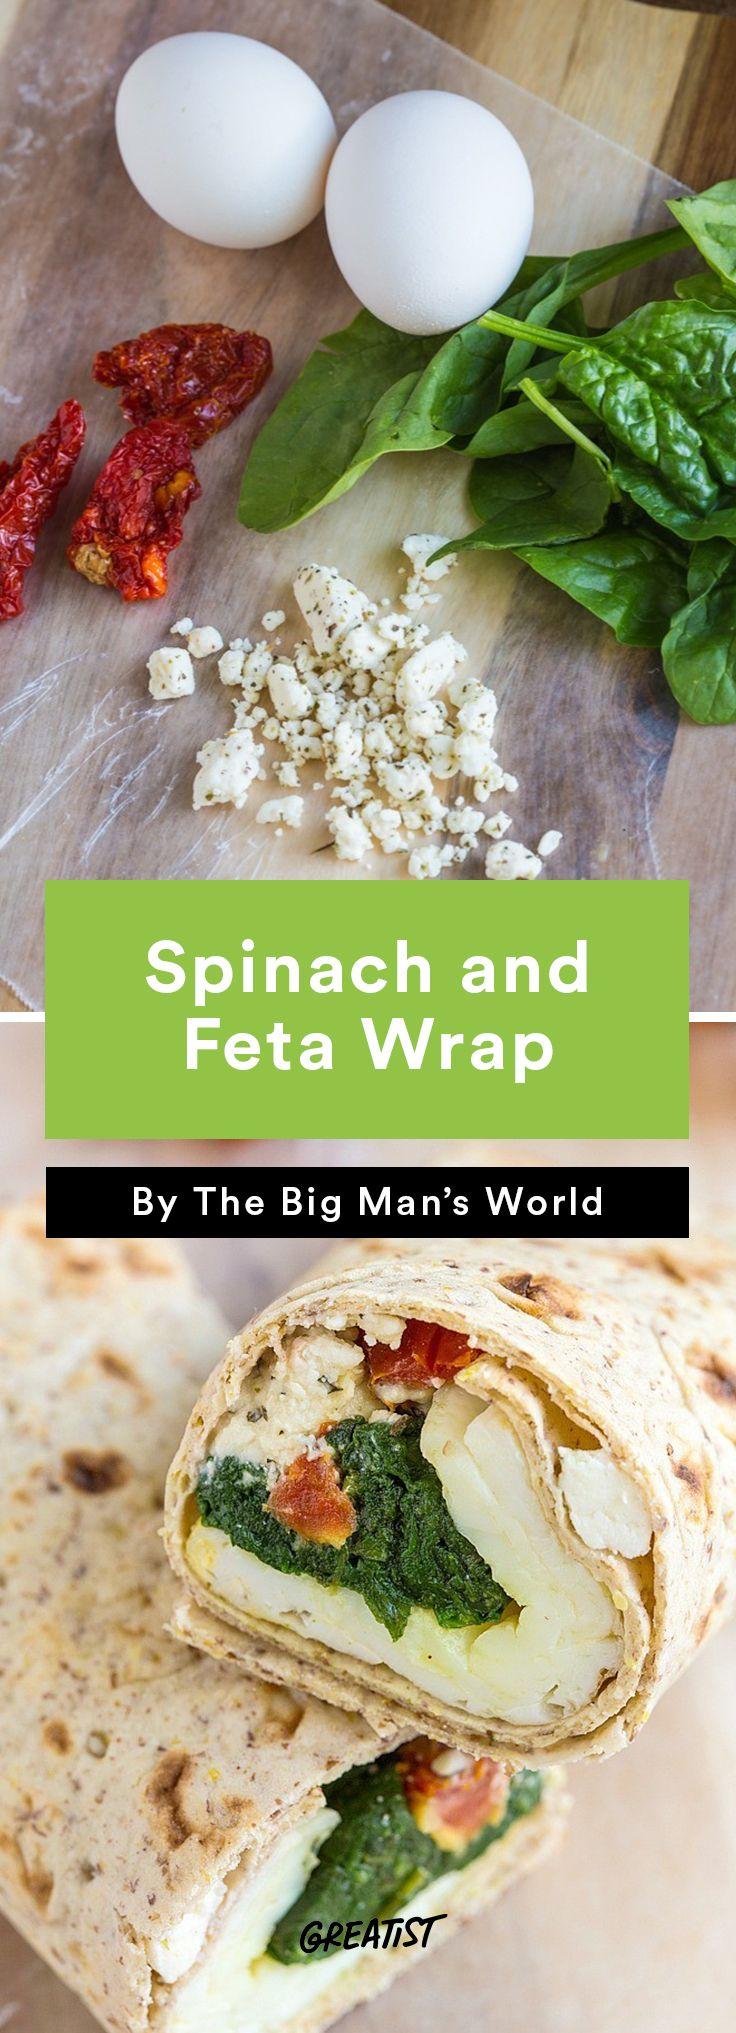 2. Spinach and Feta Wrap #greatist http://greatist.com/eat/copycat-starbucks-breakfast-recipes